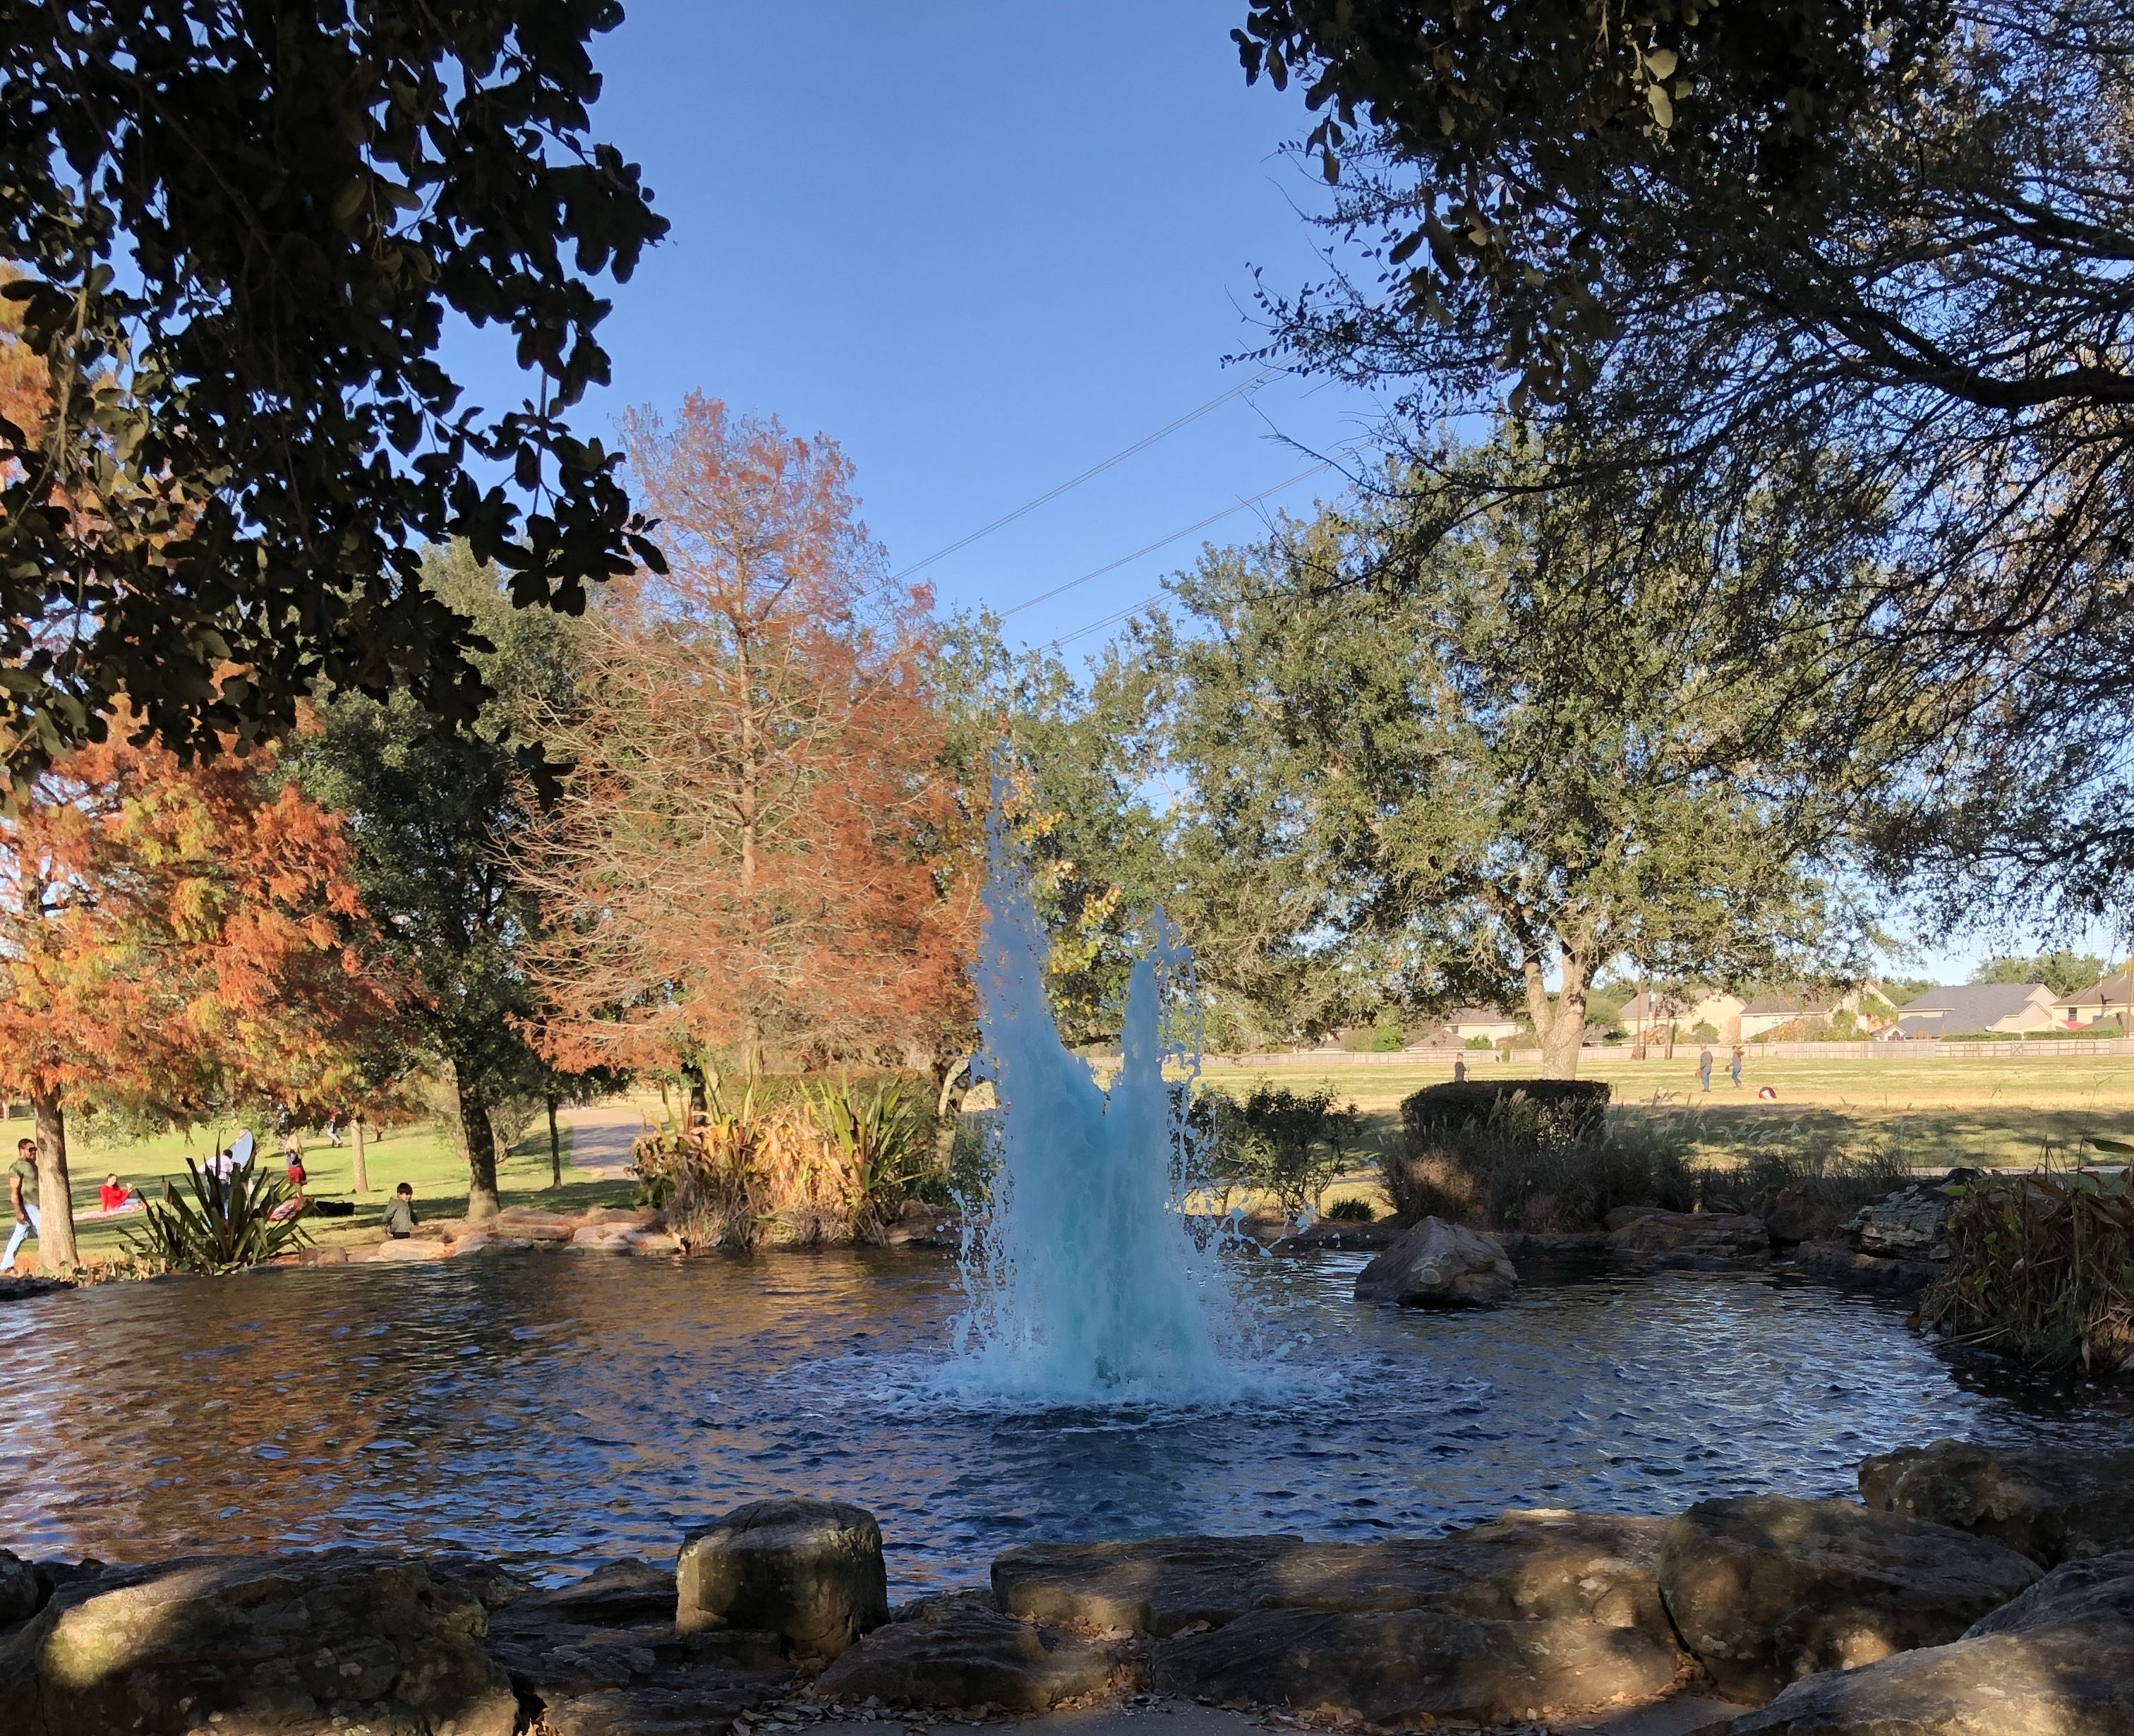 Oyster Creek Park | Oyster creek park, Outdoor, Favorite ...